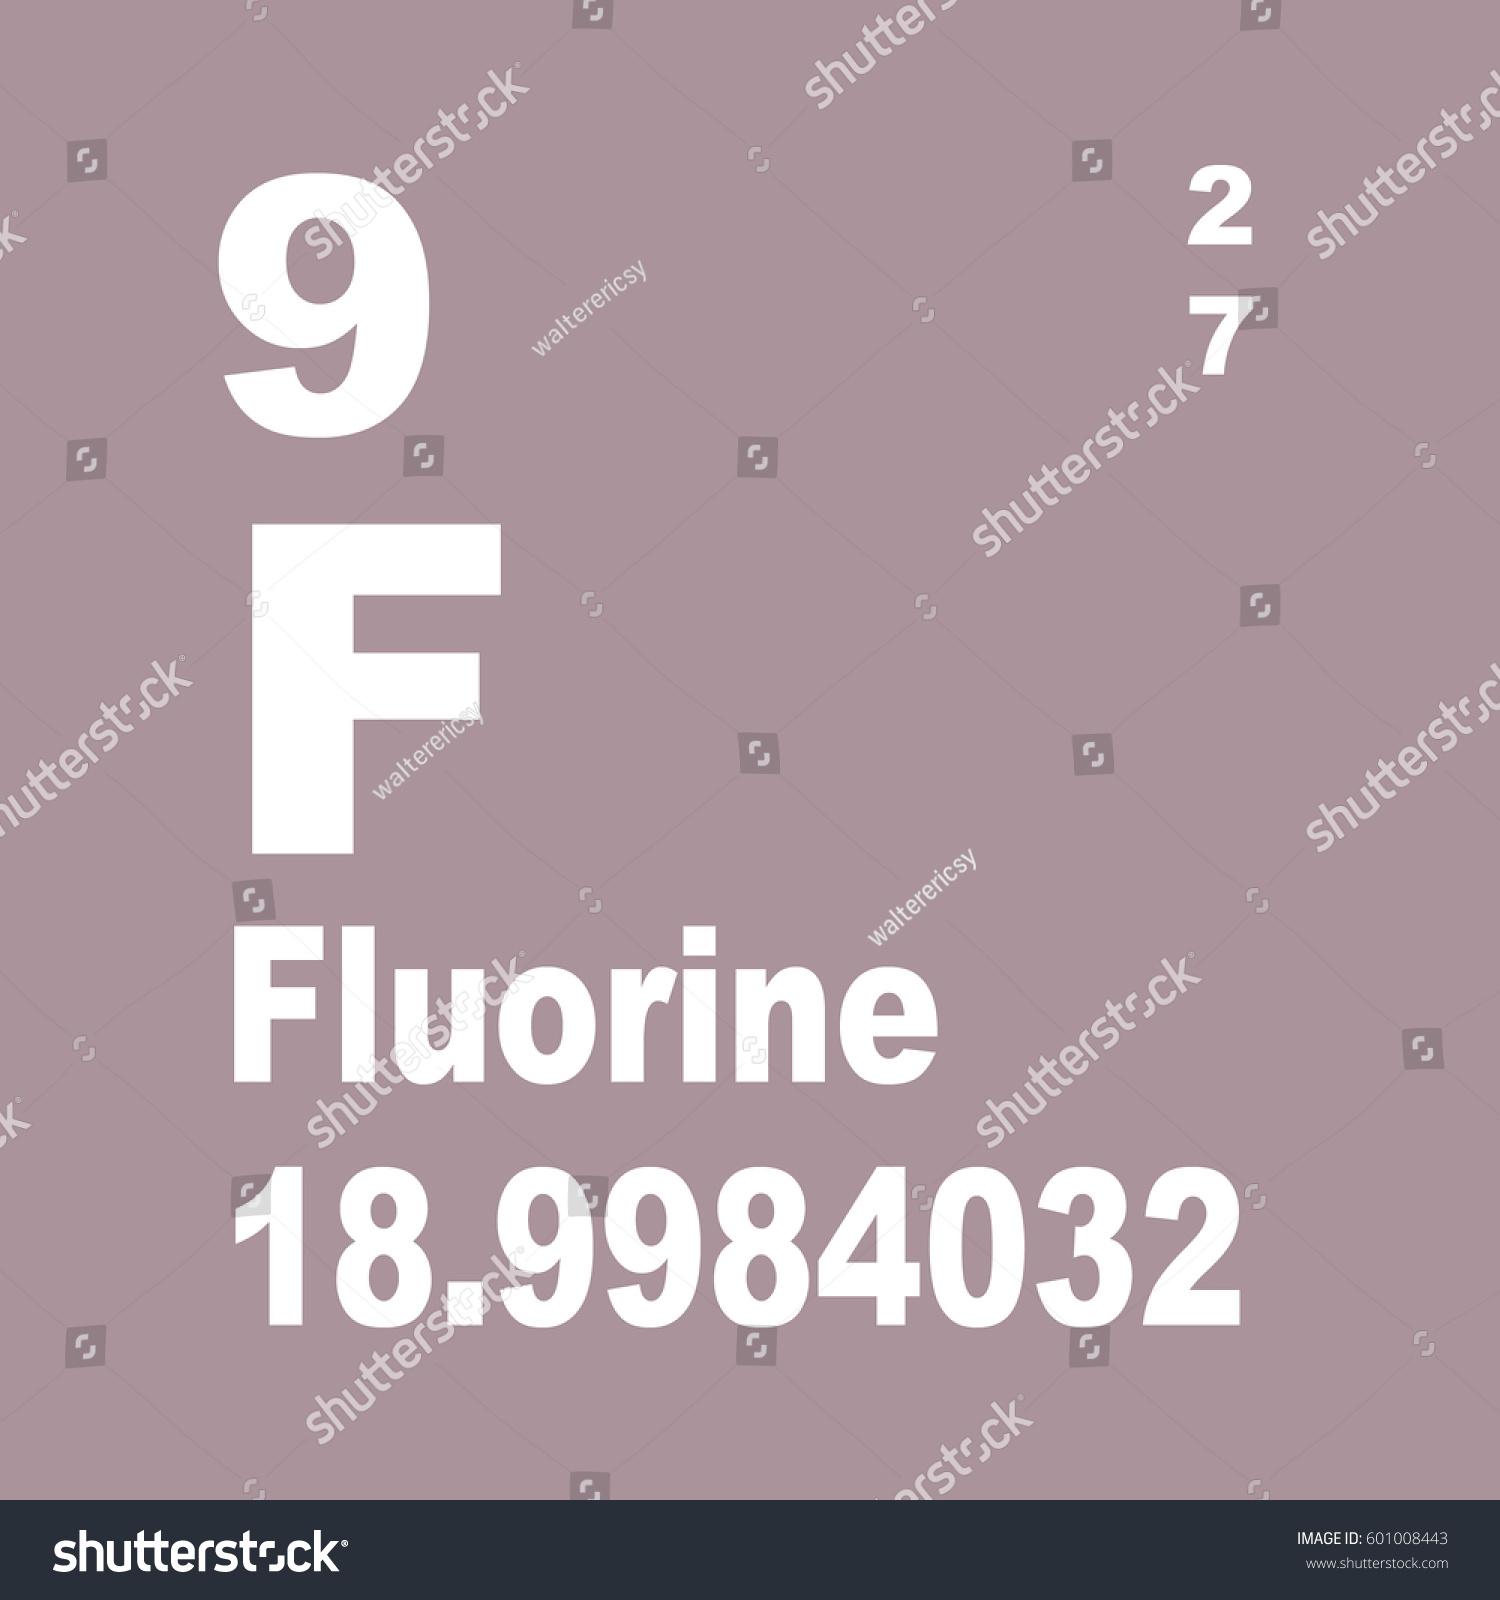 Fluorine periodic table elements stock illustration 601008443 fluorine periodic table of elements gamestrikefo Gallery